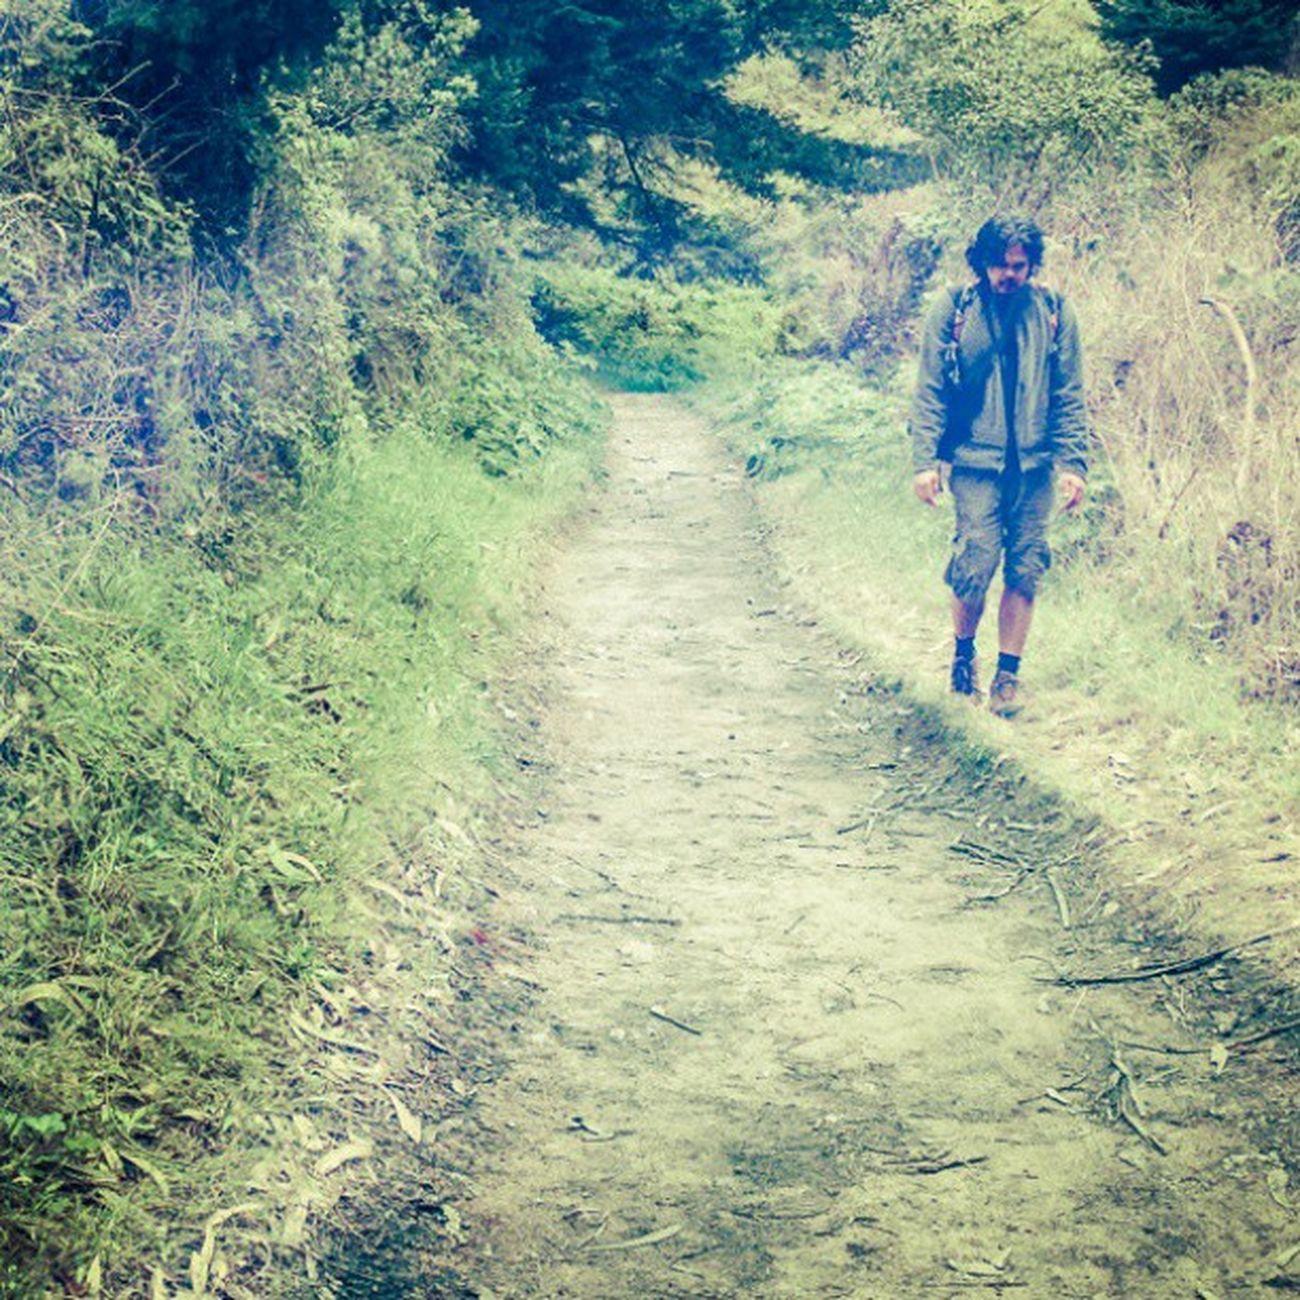 Hiking the less beaten path of Palomarin Trailhead. Bolinas , California